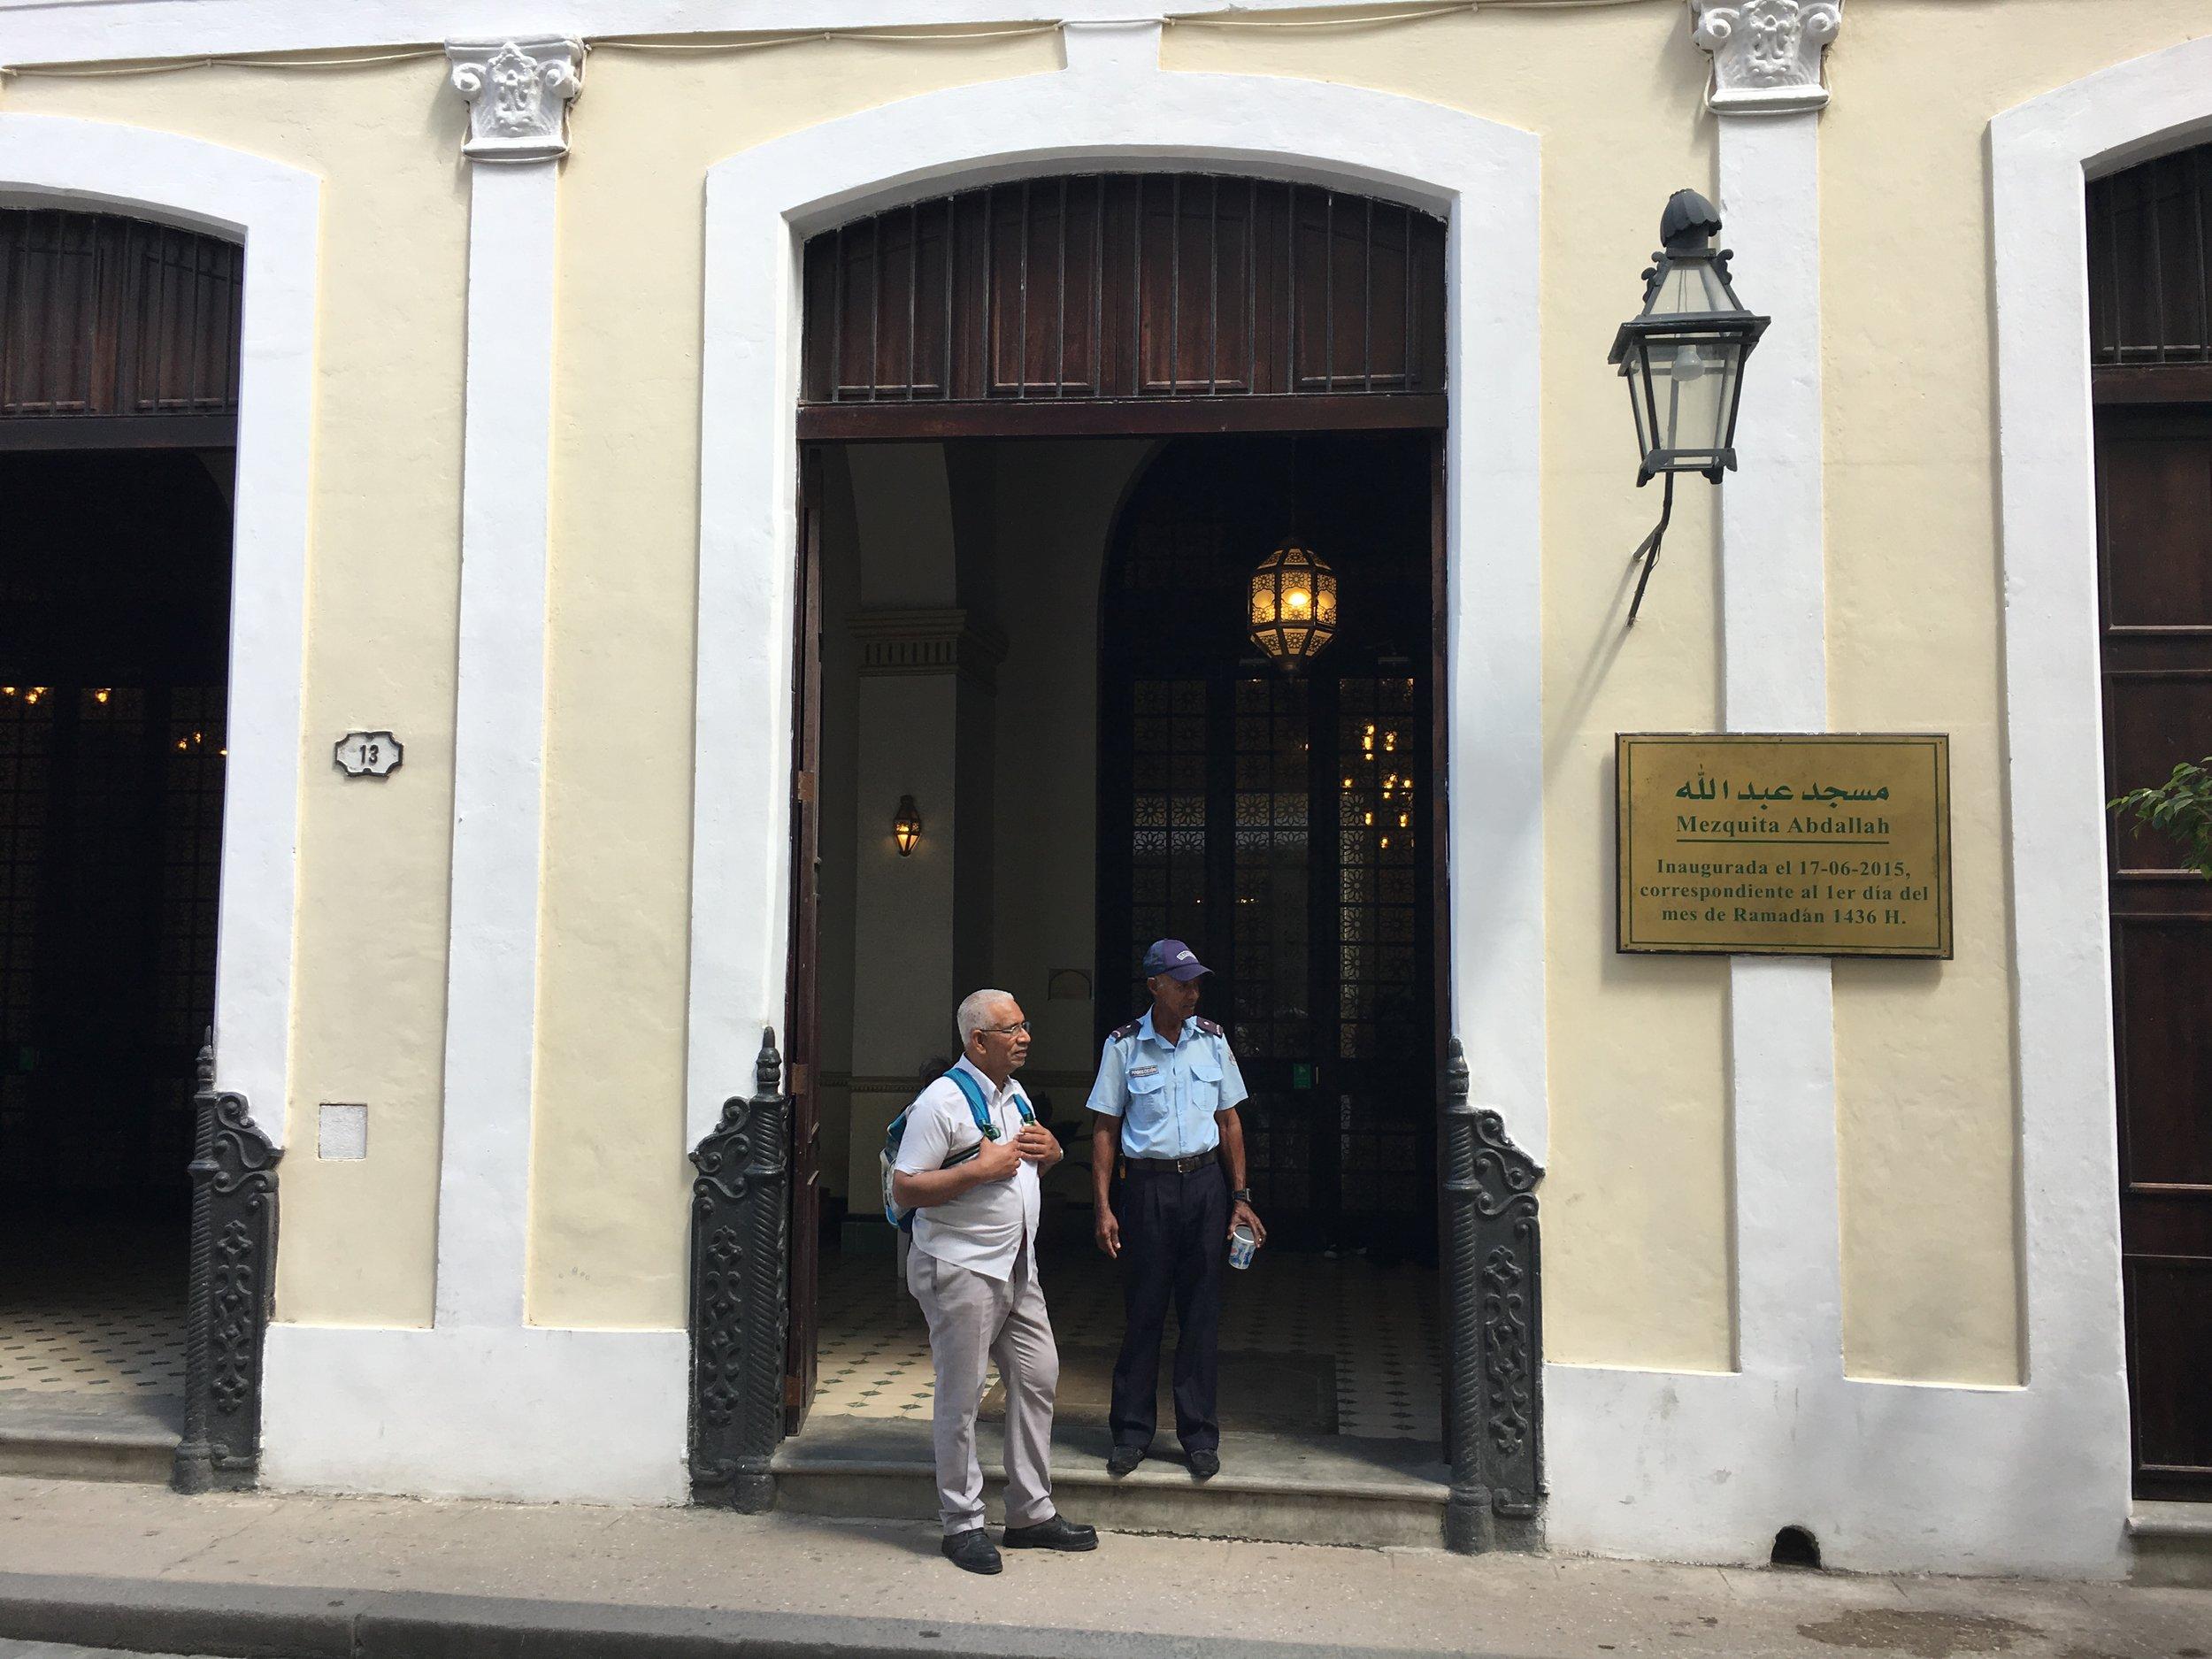 The entrance to Mezquita Abdallah in Havana, Cuba (PHOTO: Ken Chitwood).